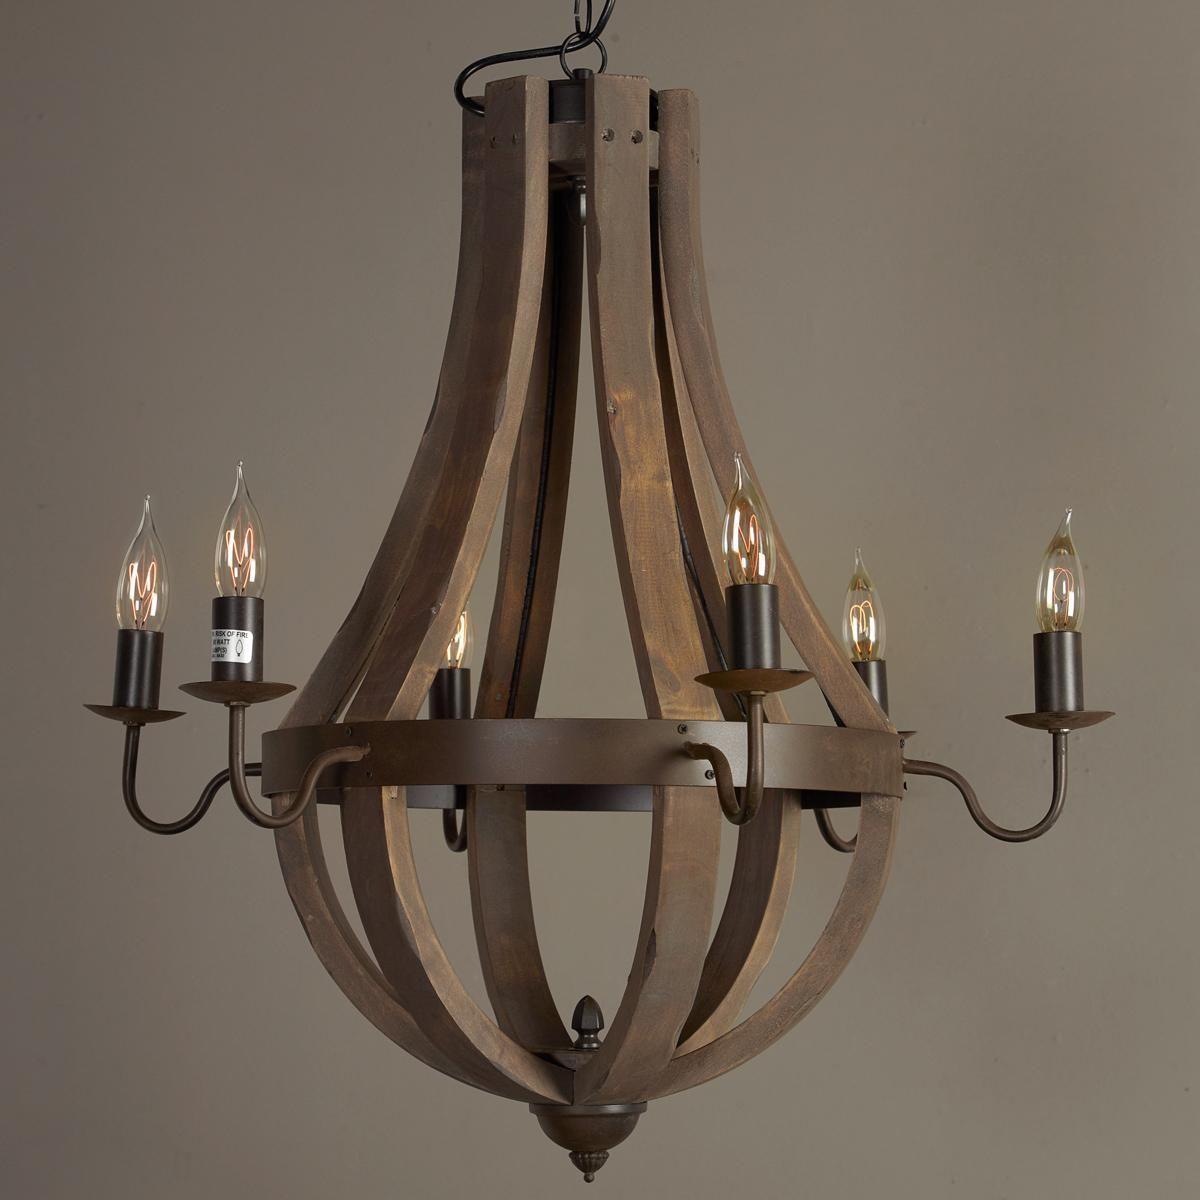 black item chandelier zoom tbwb lighting whiskey barrel textured ashwood craftmade